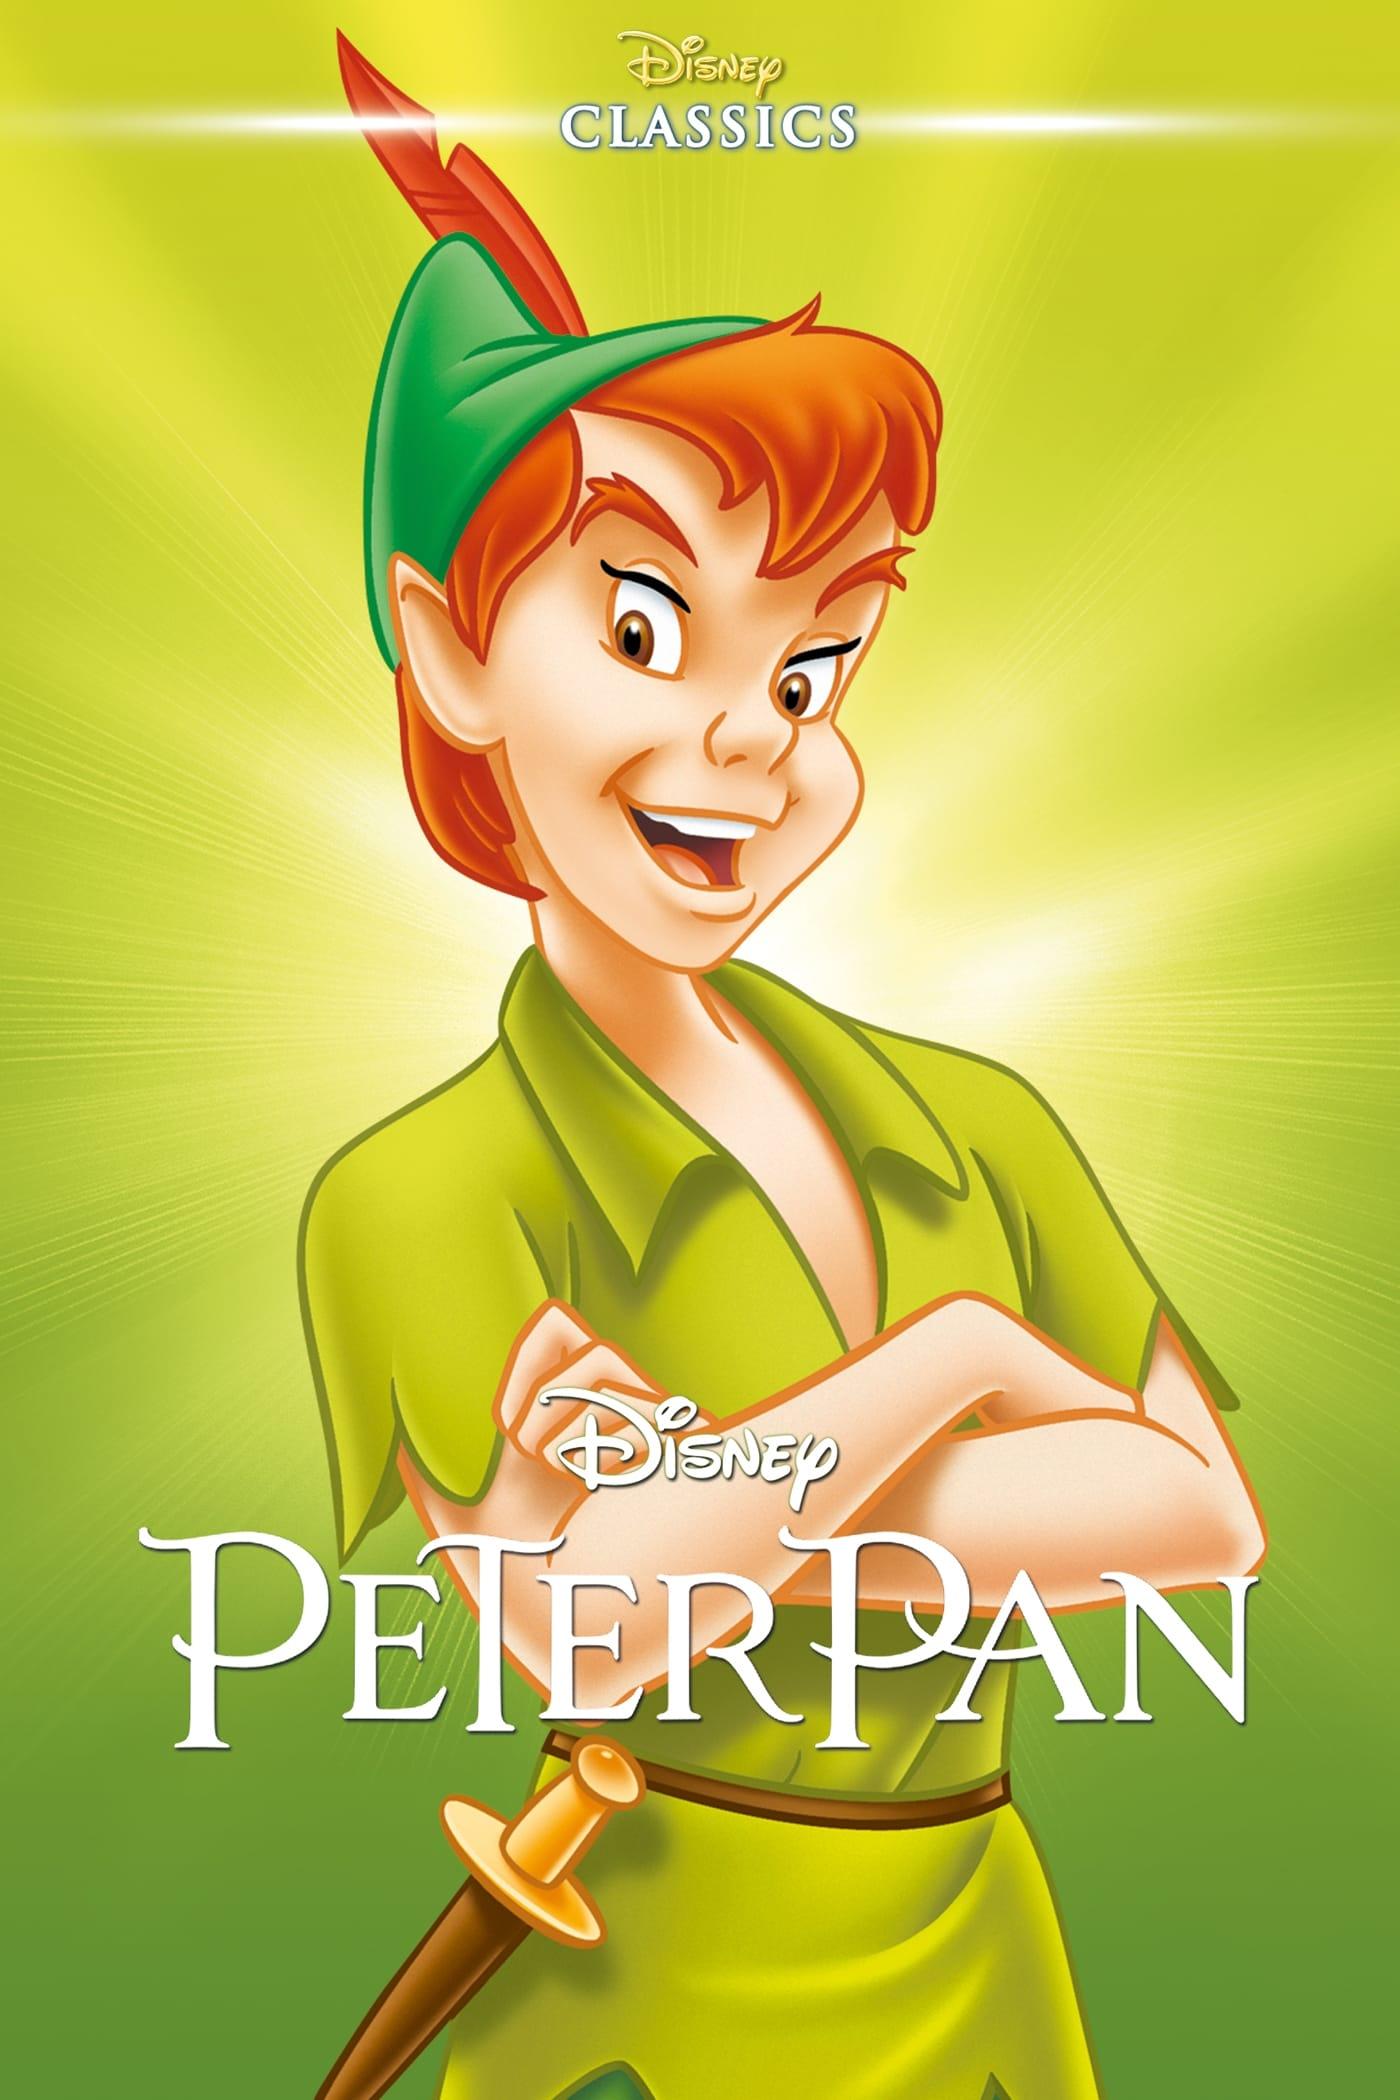 As aventuras de peter pan 1953 - Image de peter pan ...